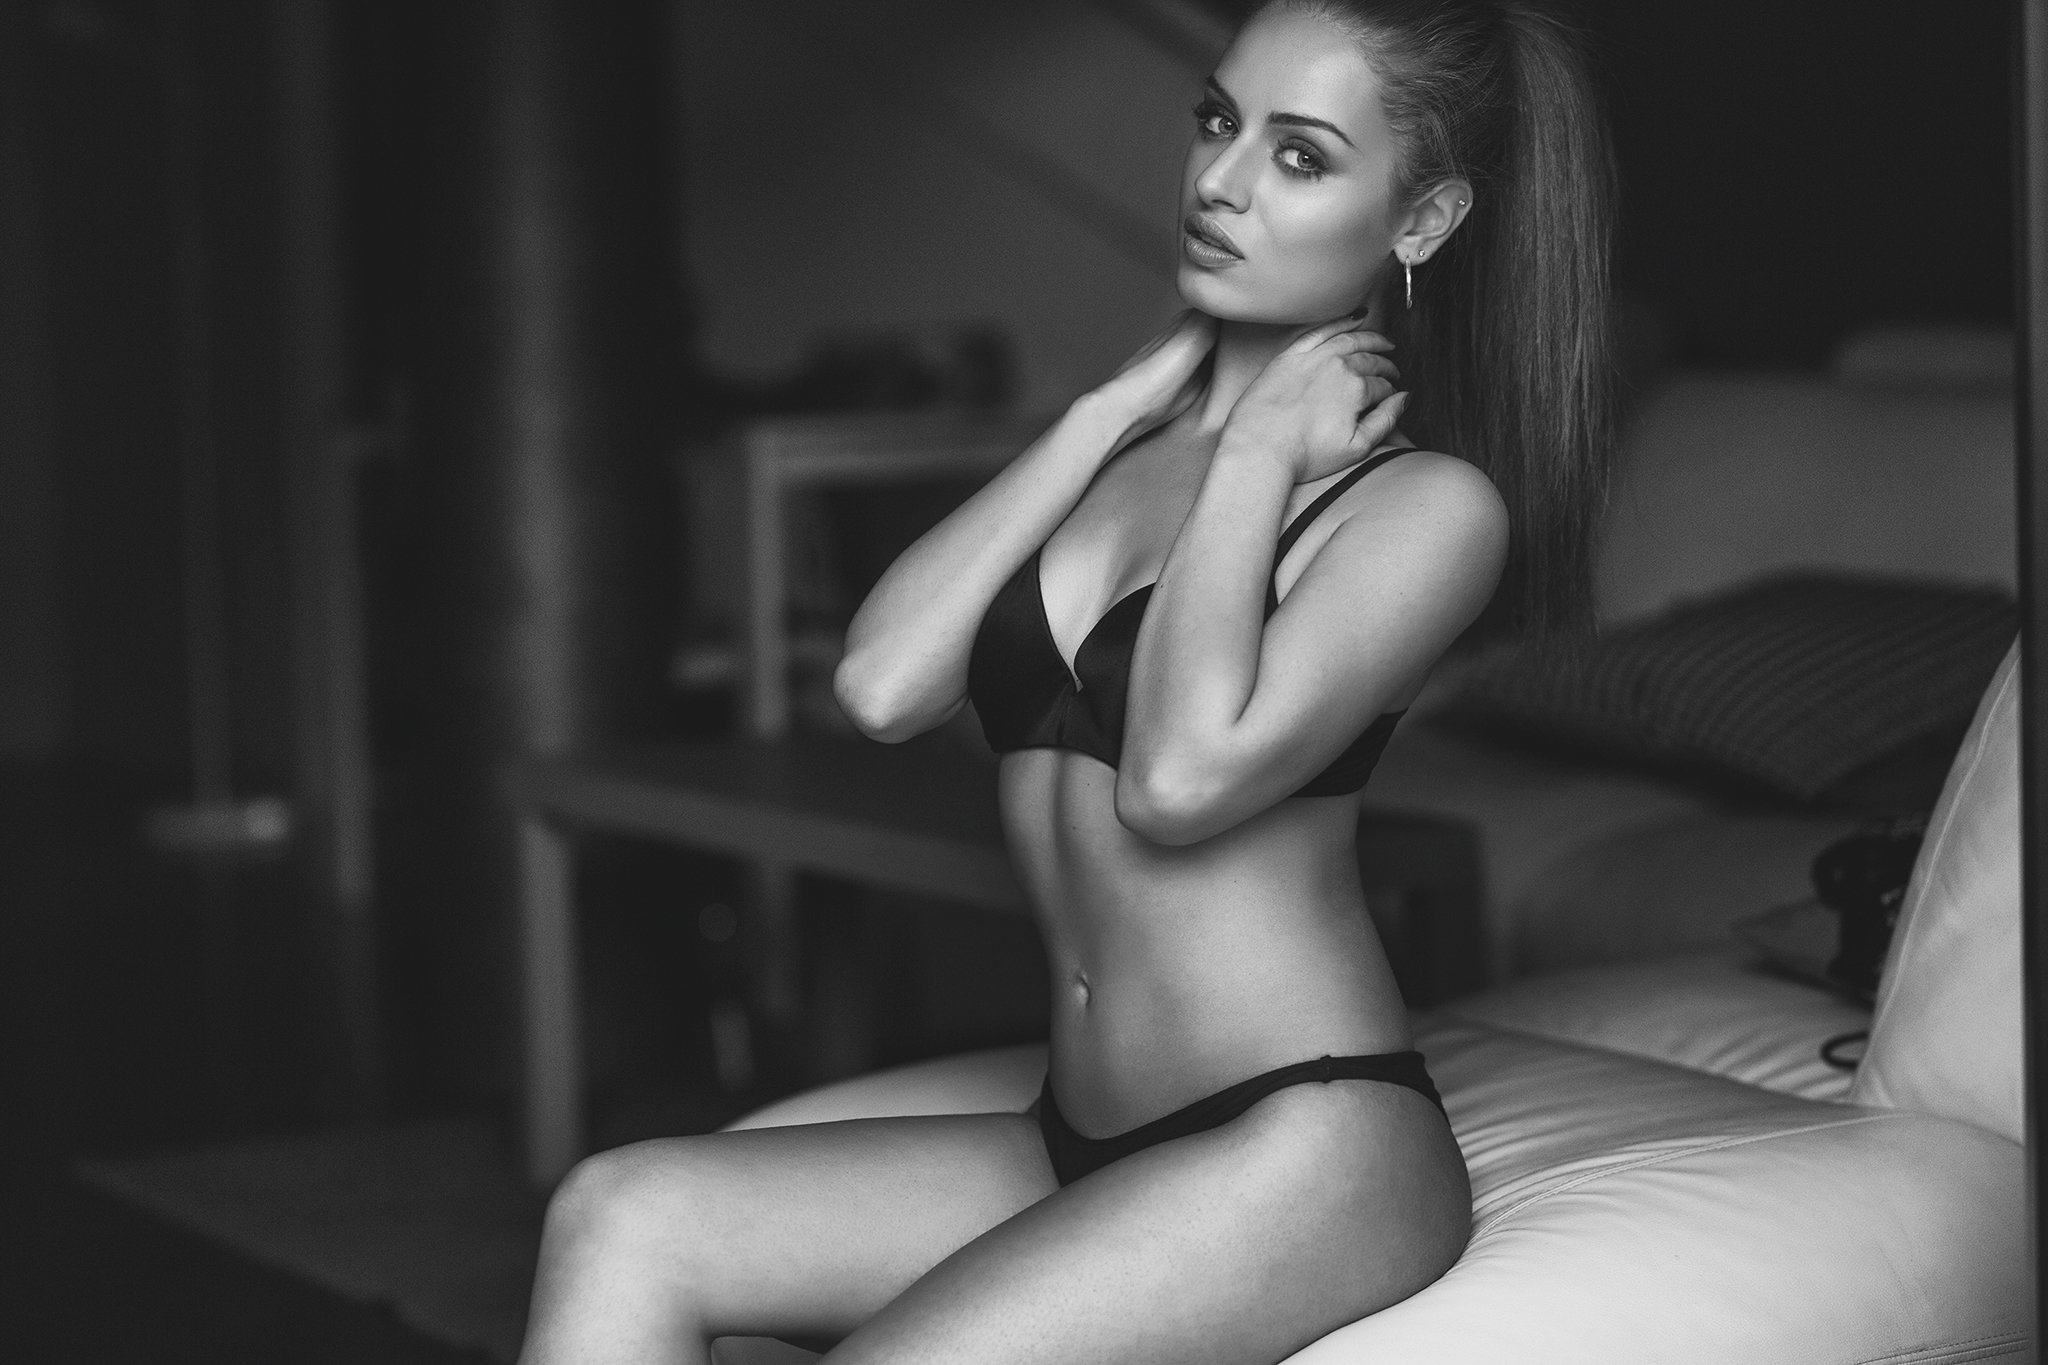 model,glamour,lingerie,blackandwhite,, roberto demaria